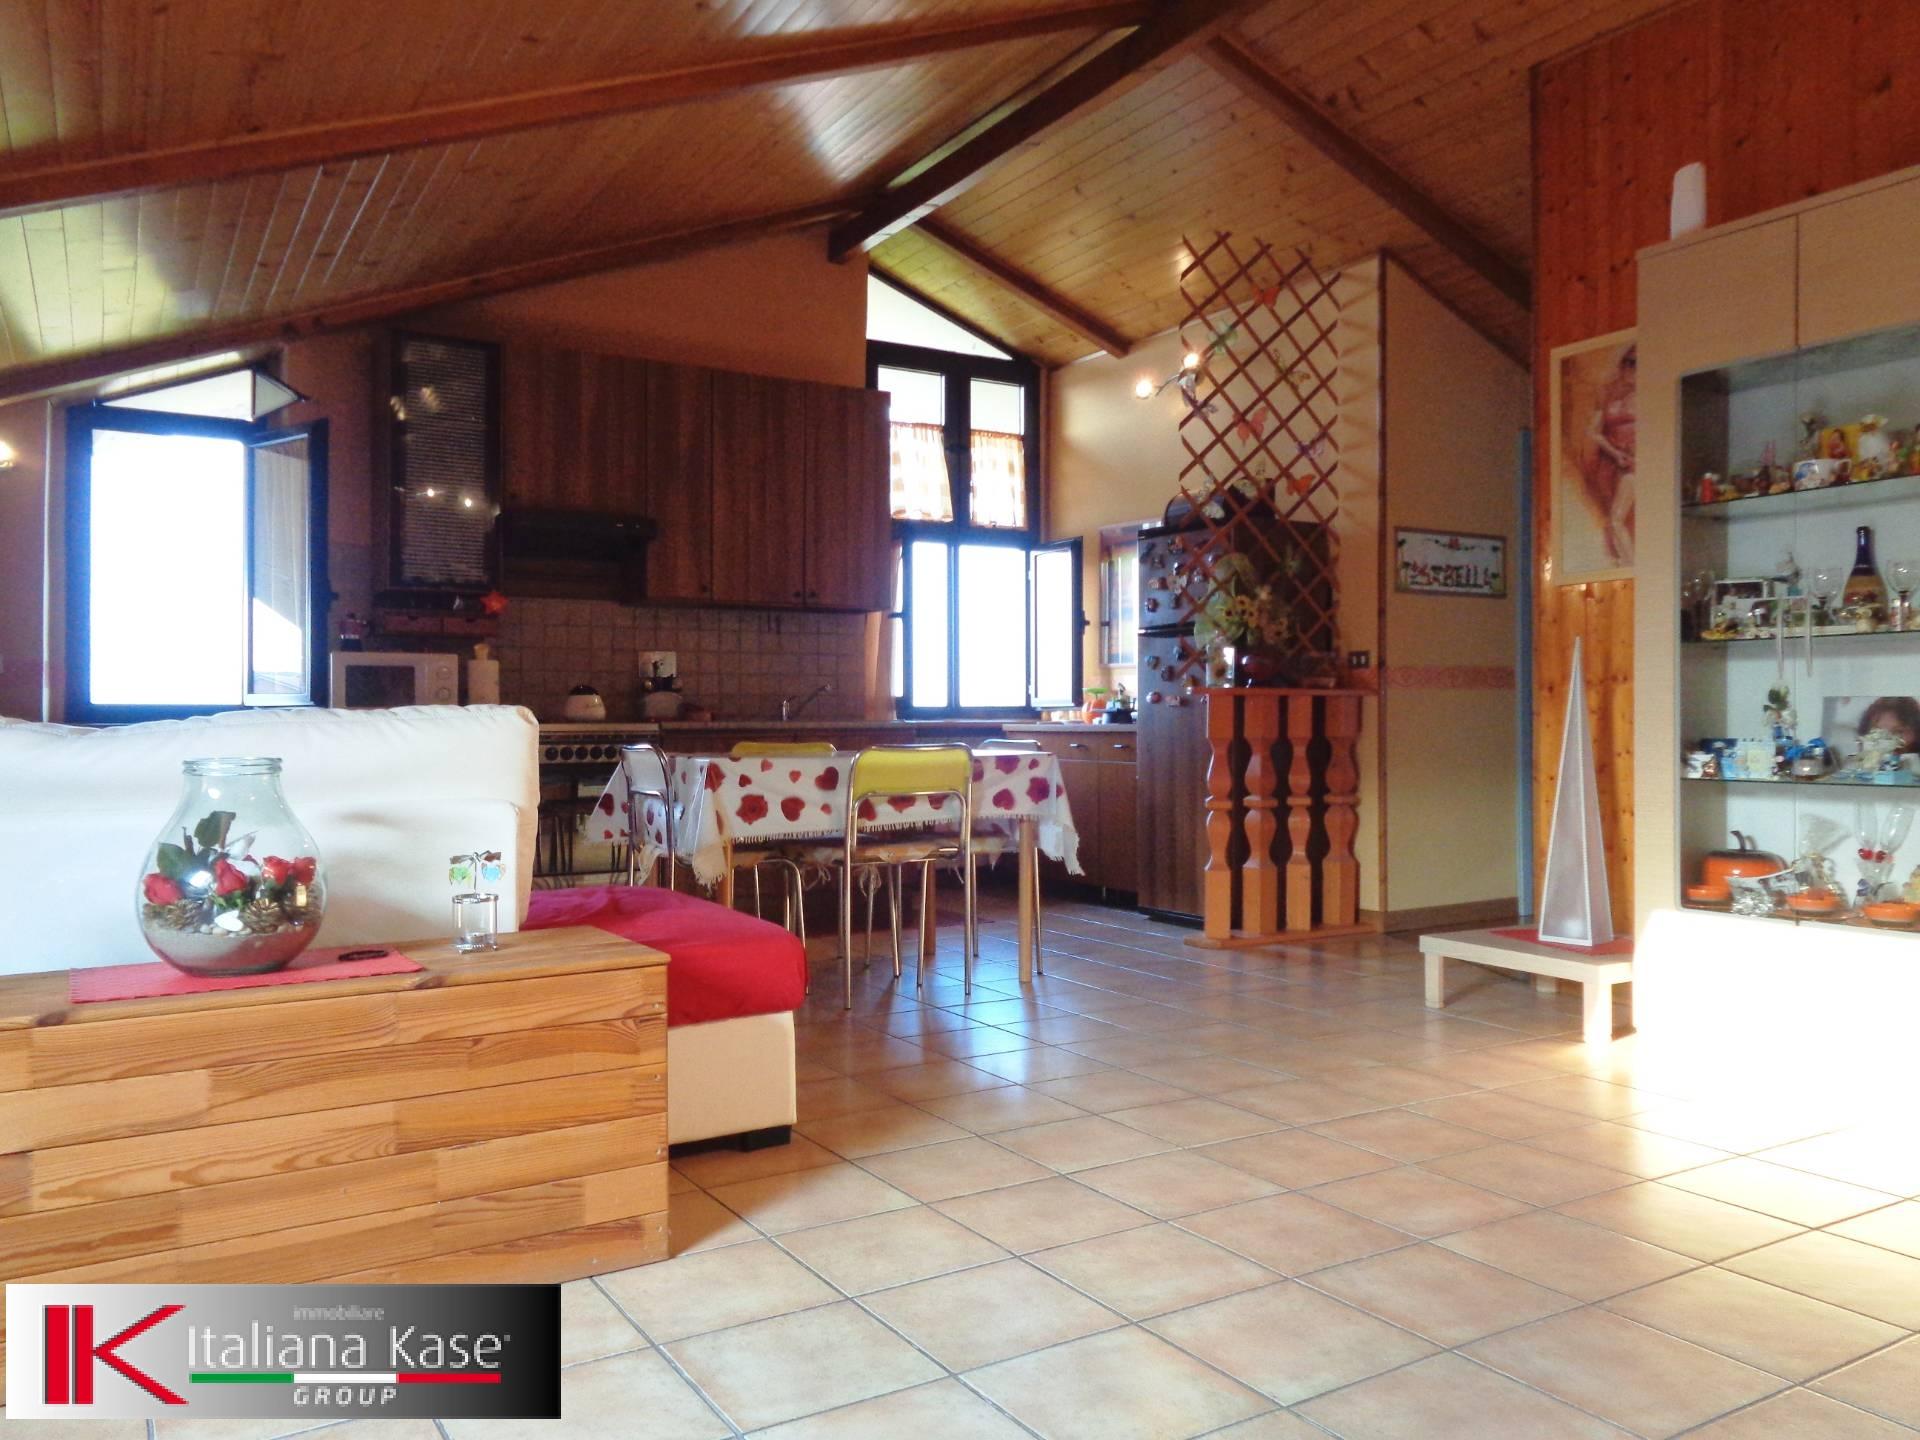 Bilocale Torrazza Piemonte  3